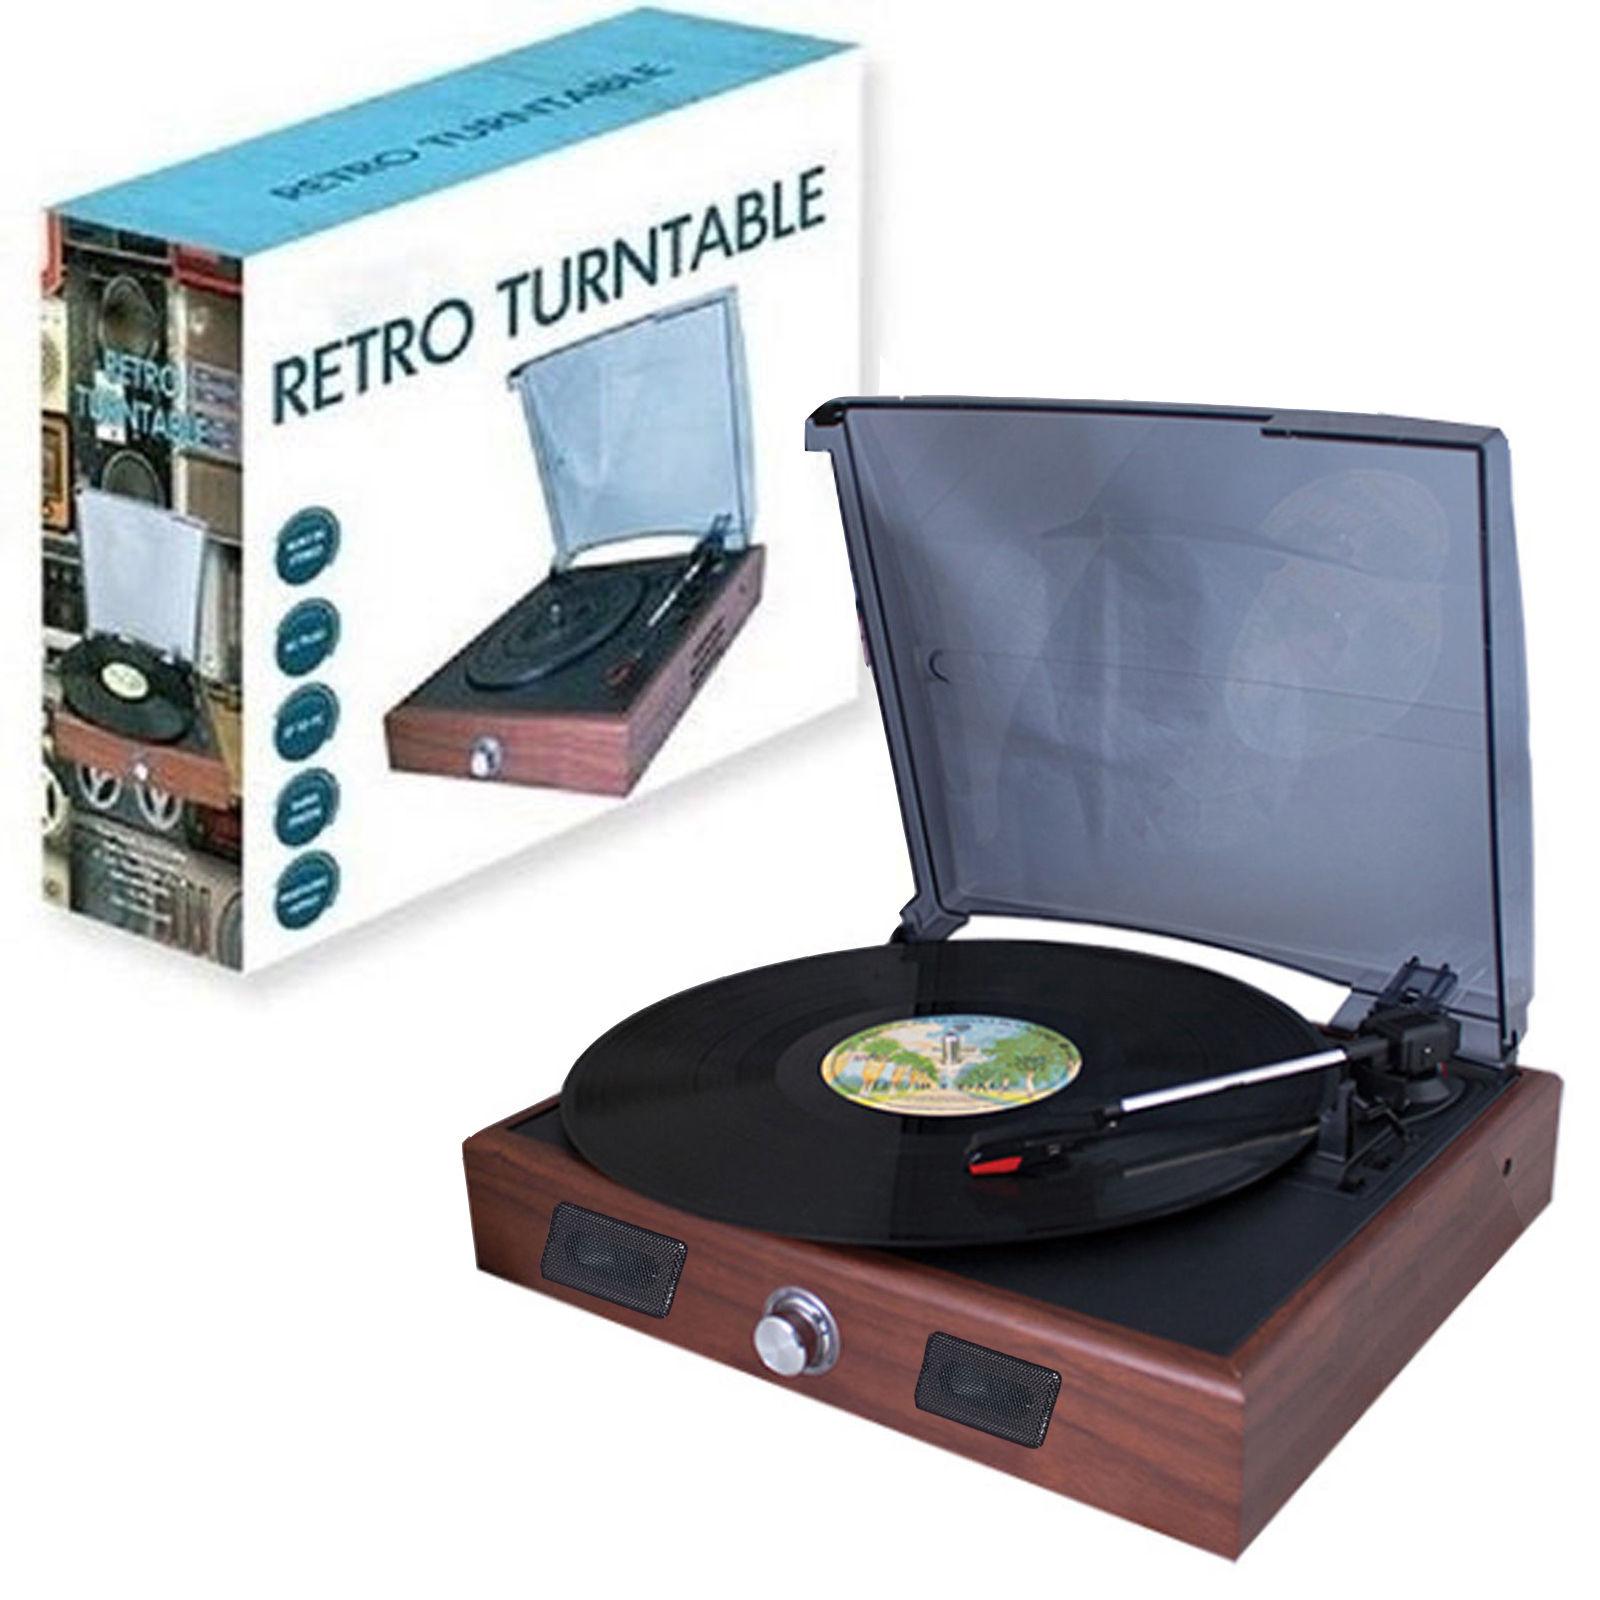 Retro 3 Speed Record Player Vinyl Turntable Built In Speakers USB To PC